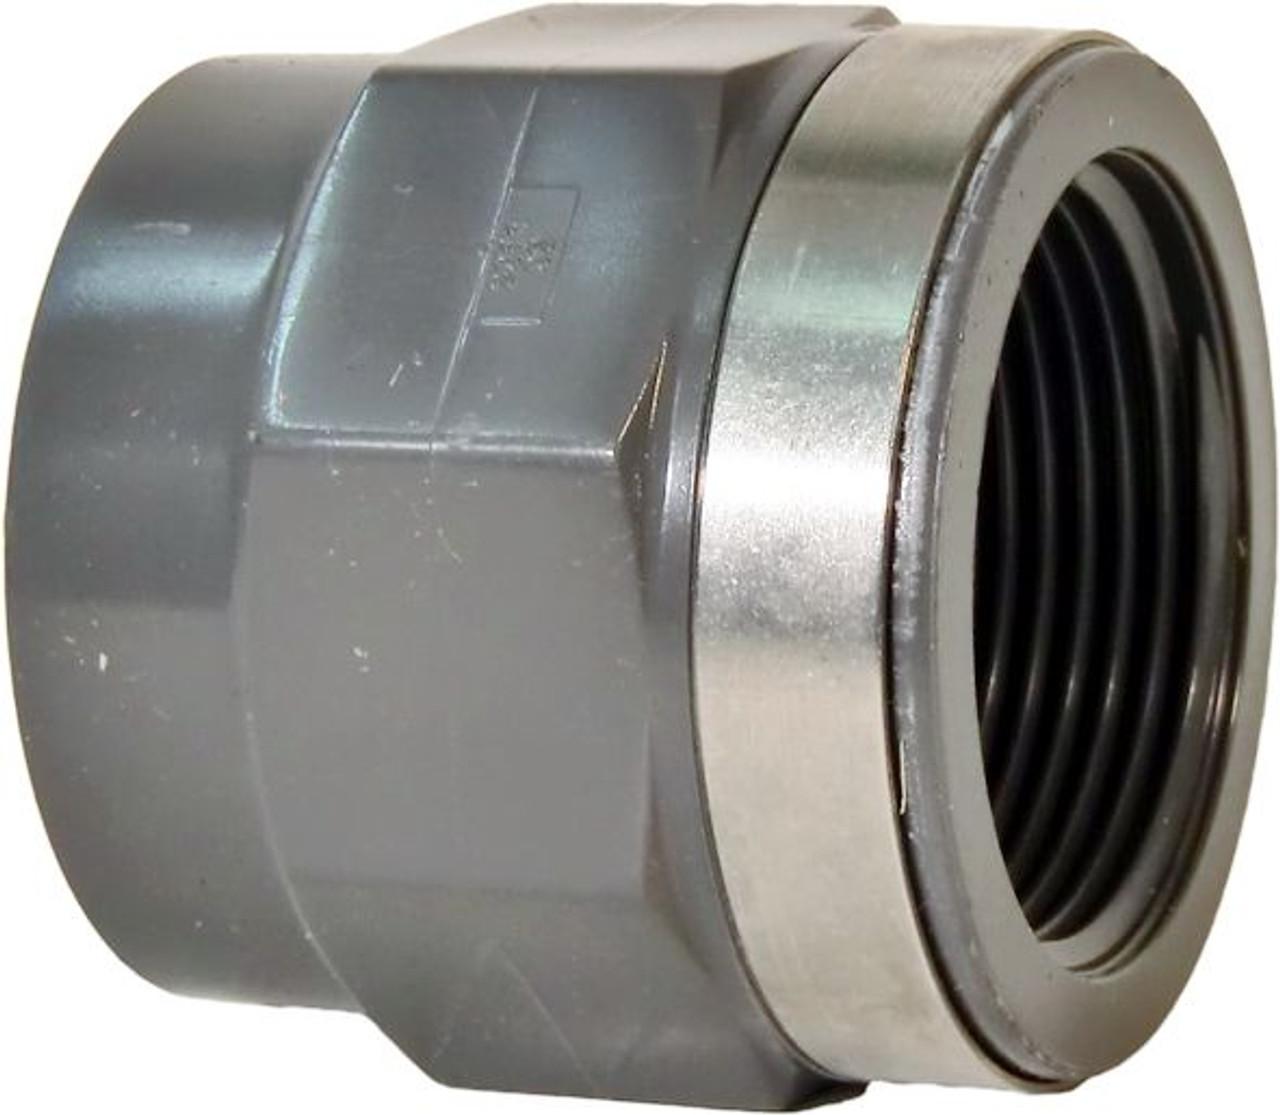 "+GF+ | F Adapter SxT SS Reinforced PVC-U 20mm-1/2"" (721910206)"